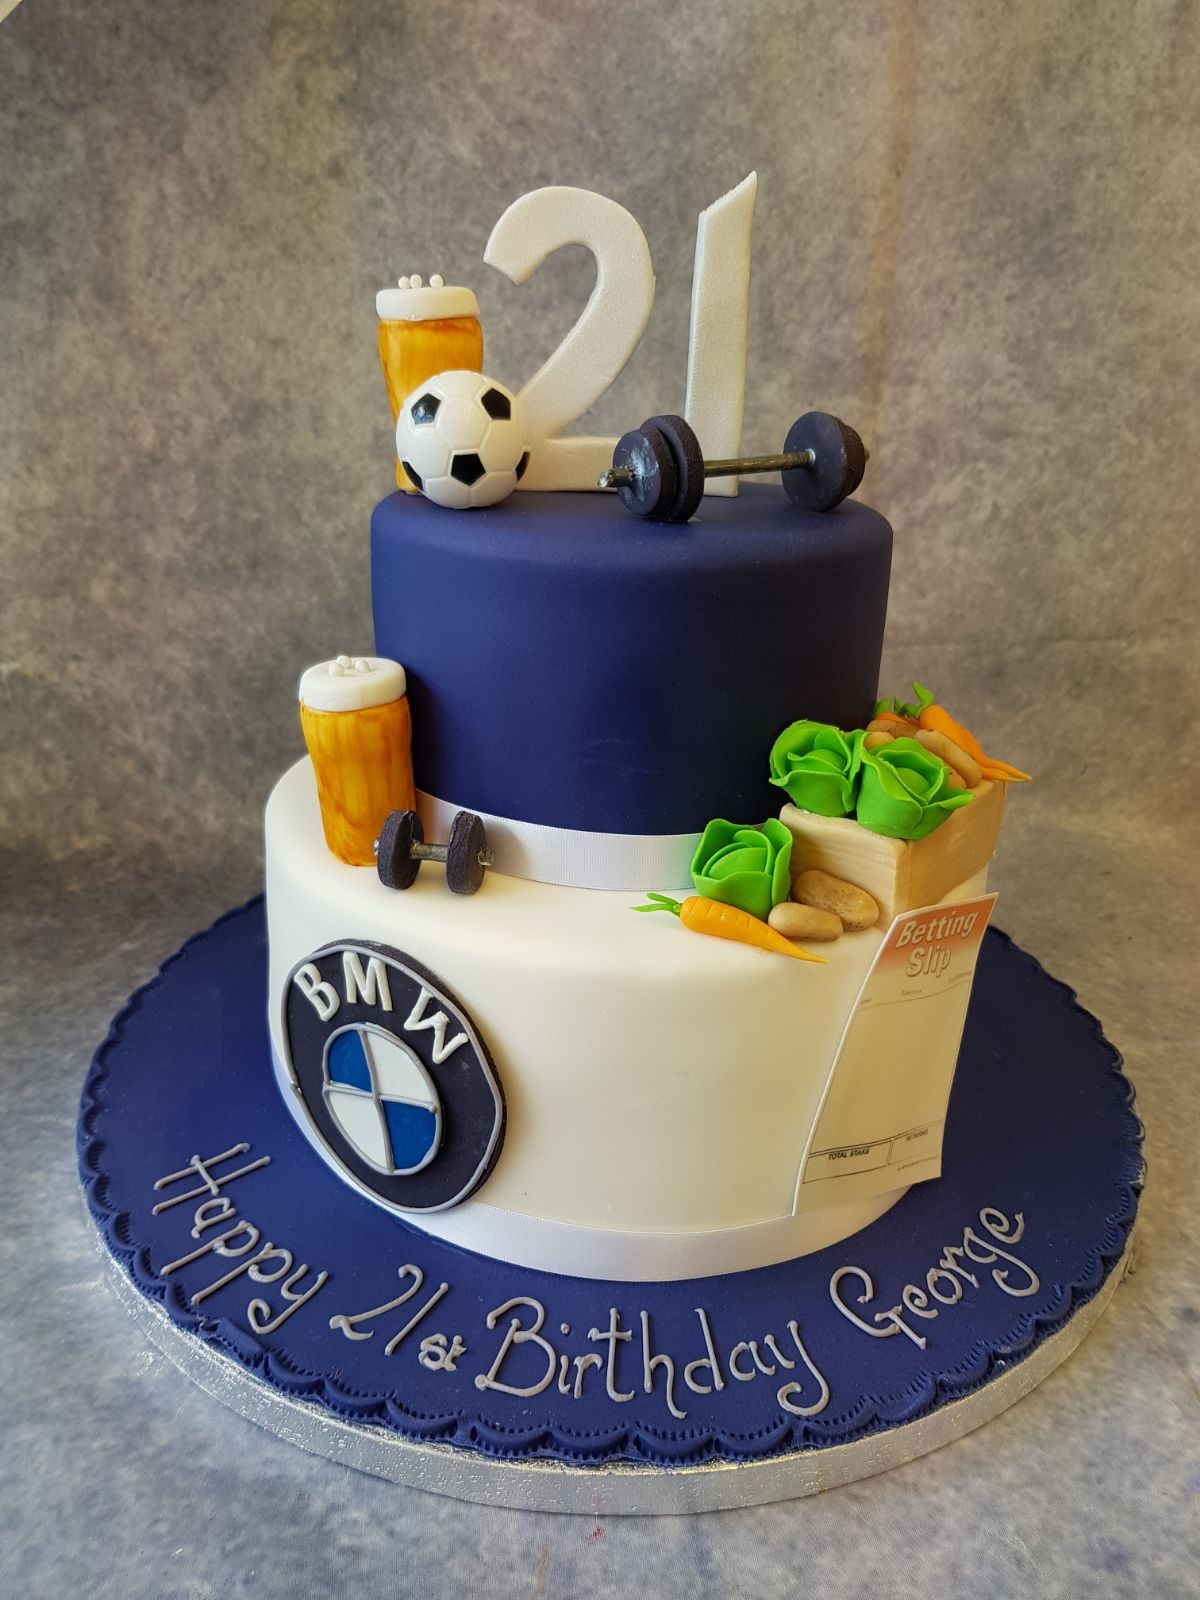 2 Tier 21st Birthday